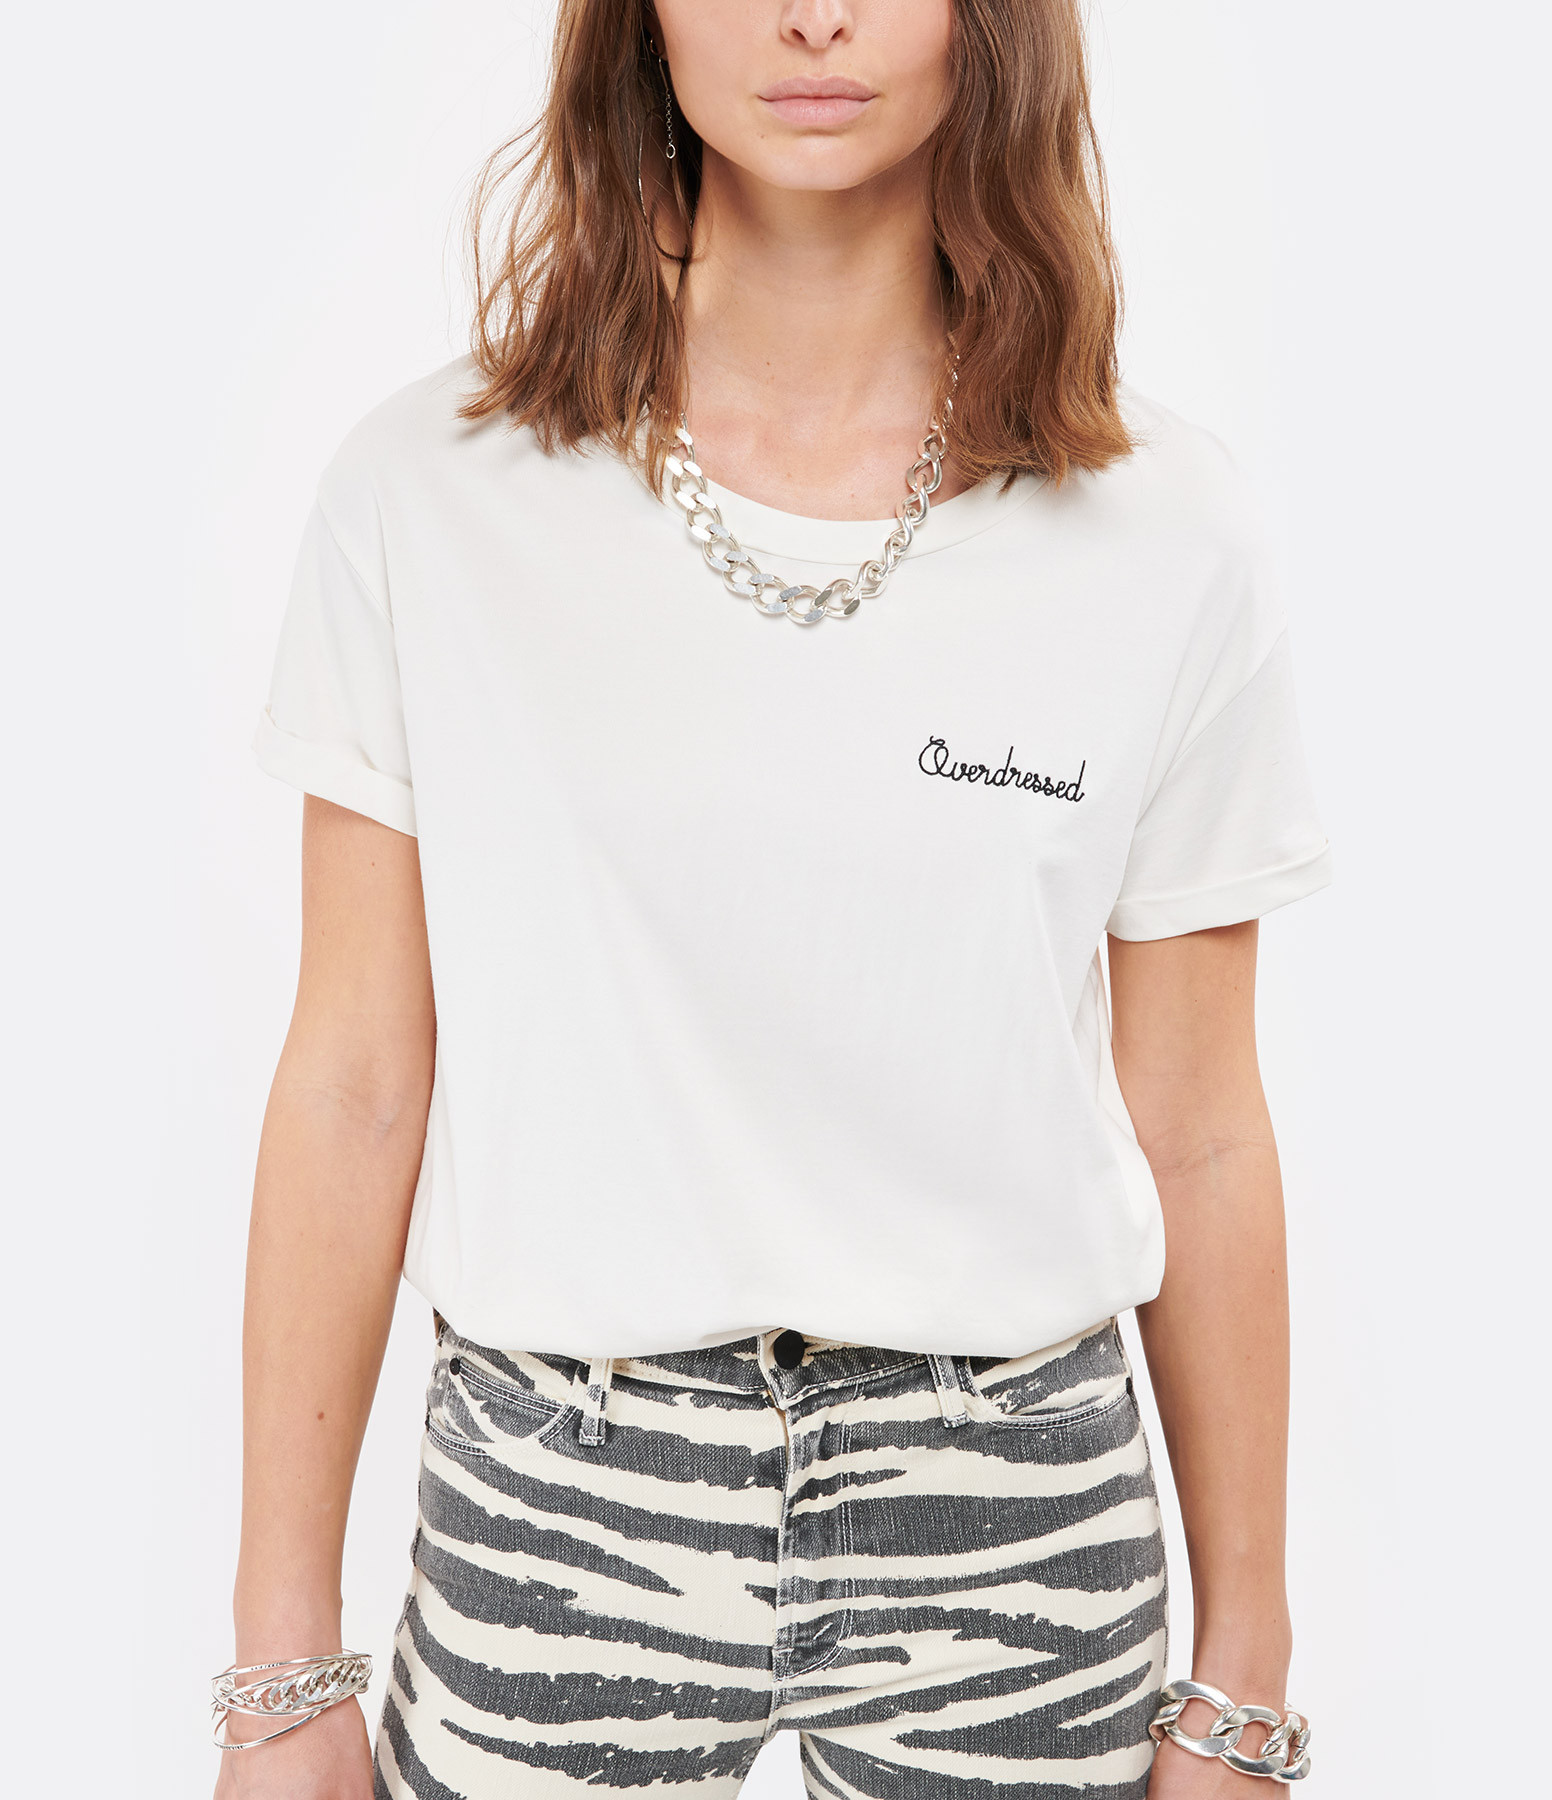 MAISON LABICHE - Tee-shirt Overdressed CotonÉcru